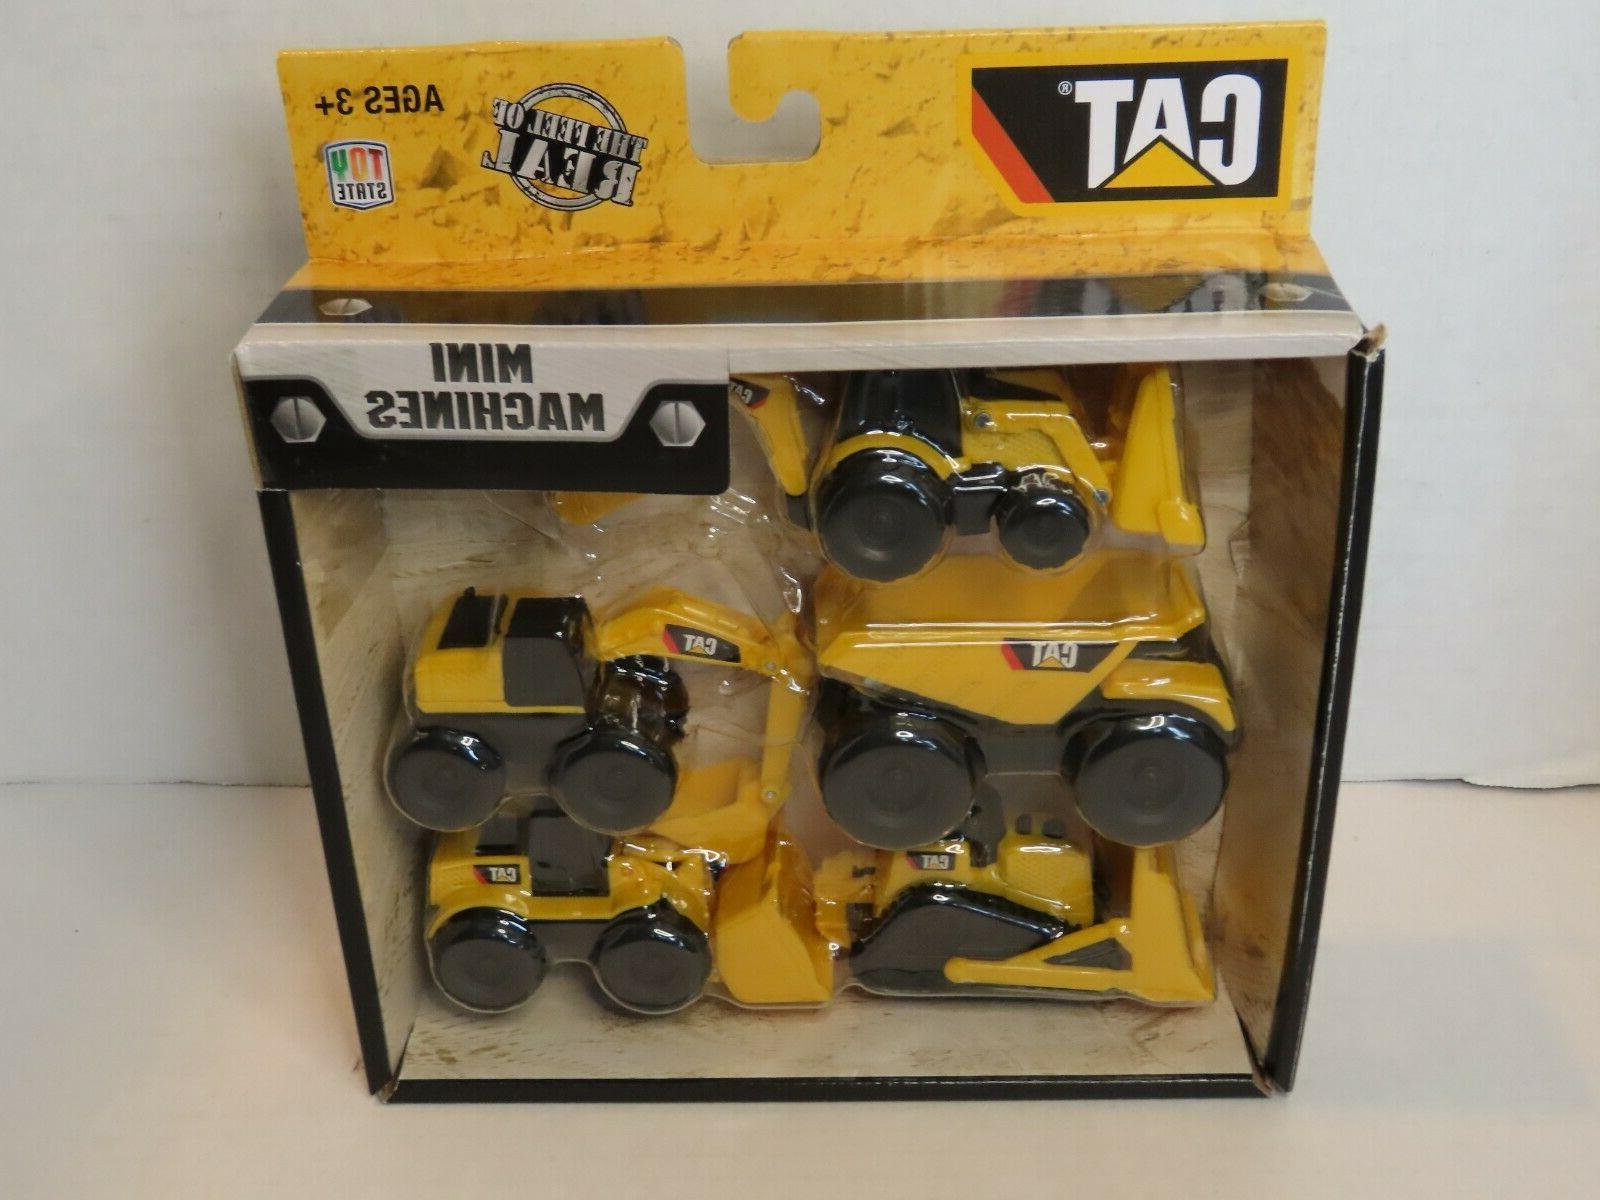 toy state caterpillar construction mini